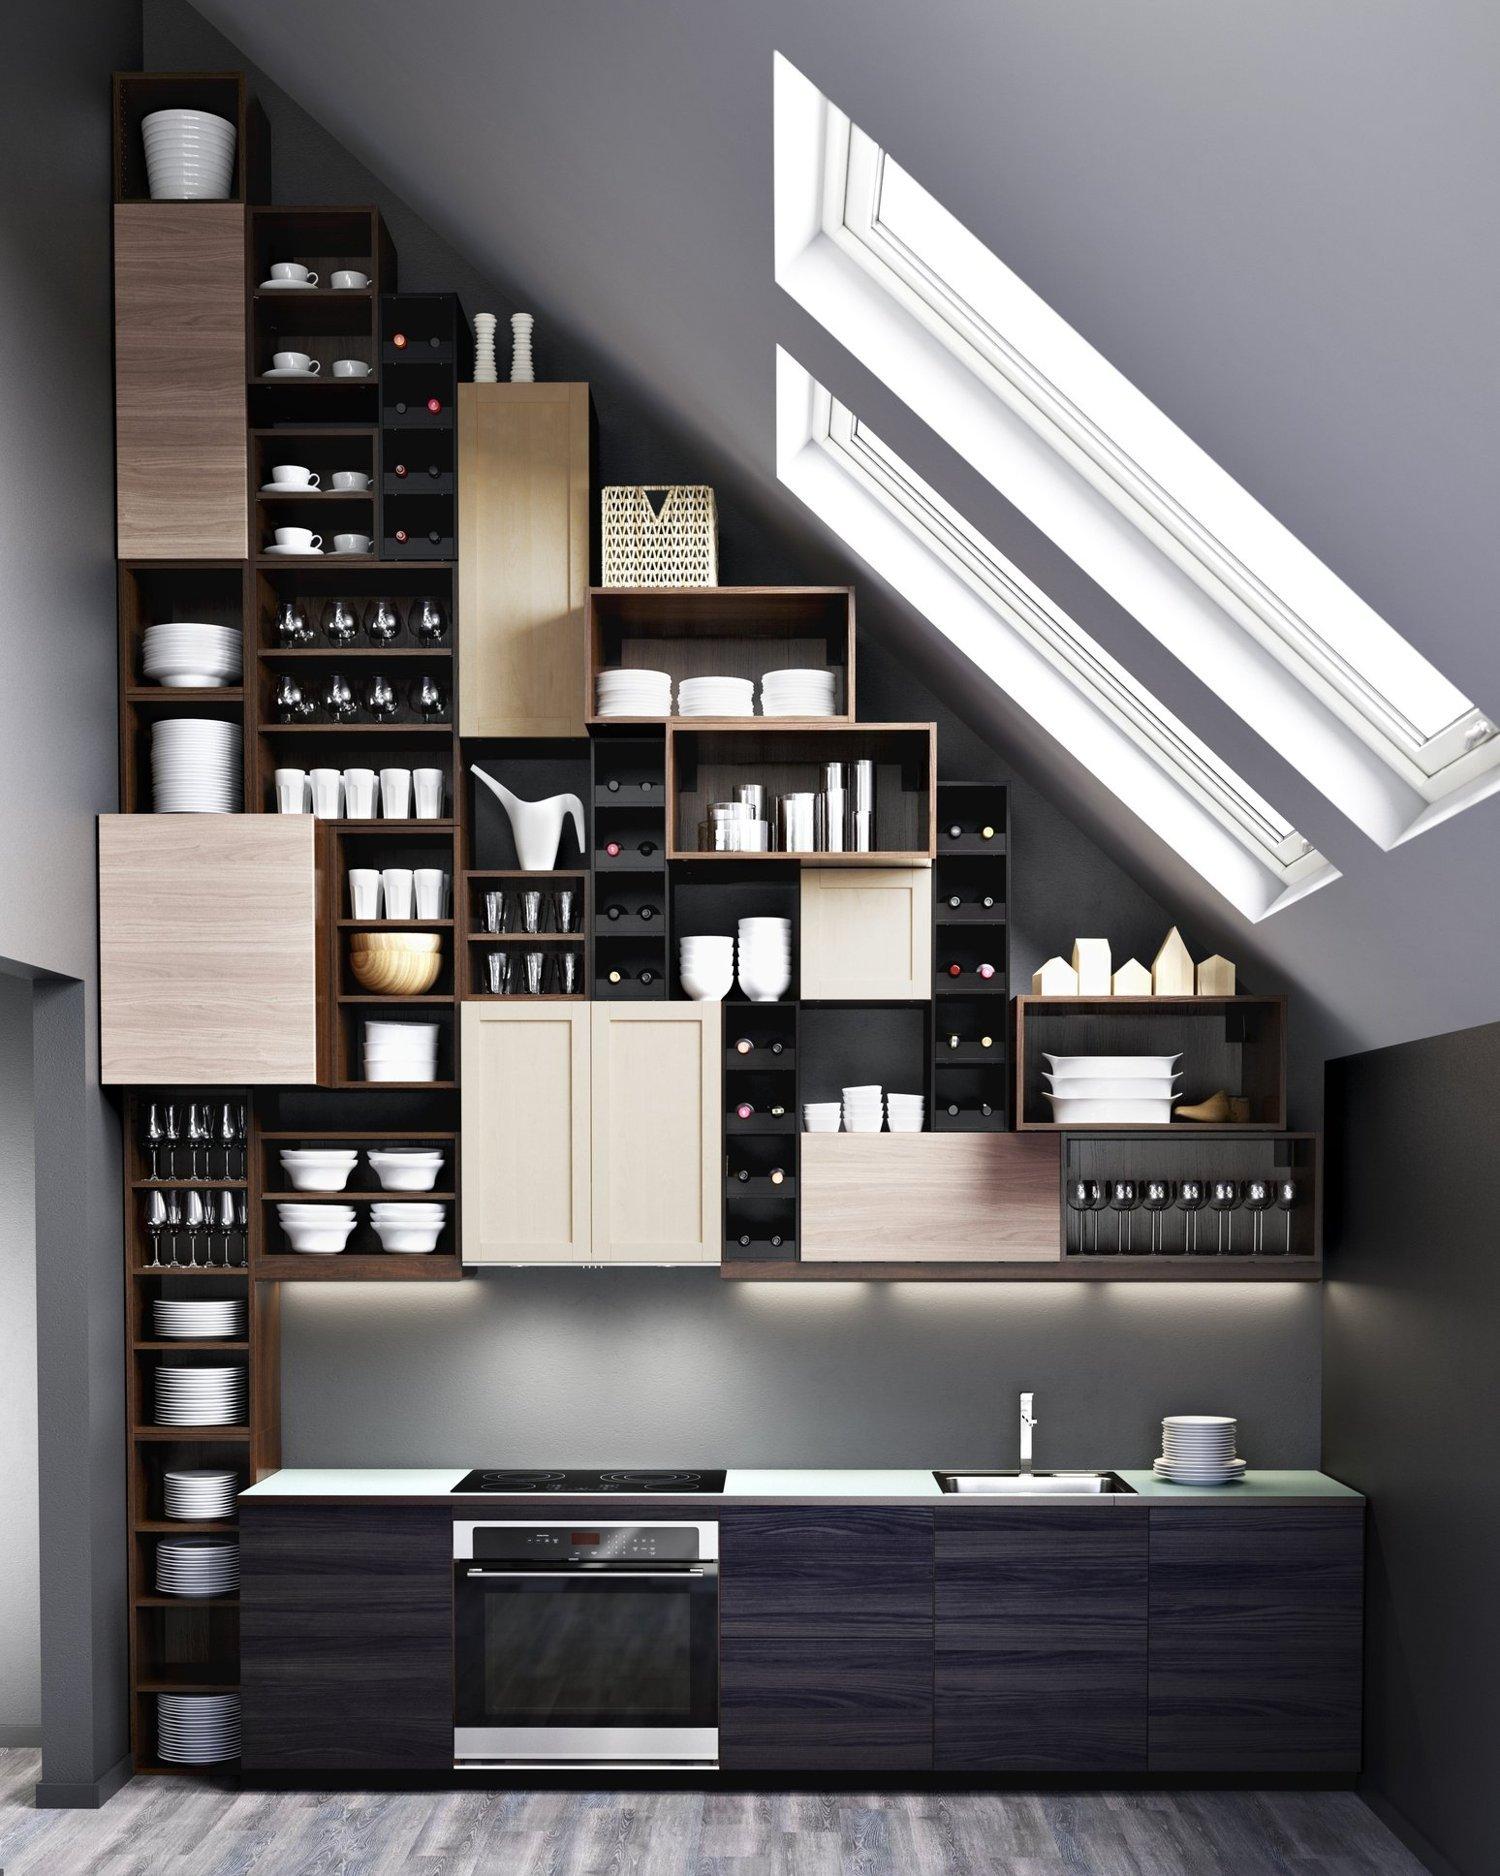 Ikea via Apartment Therapy